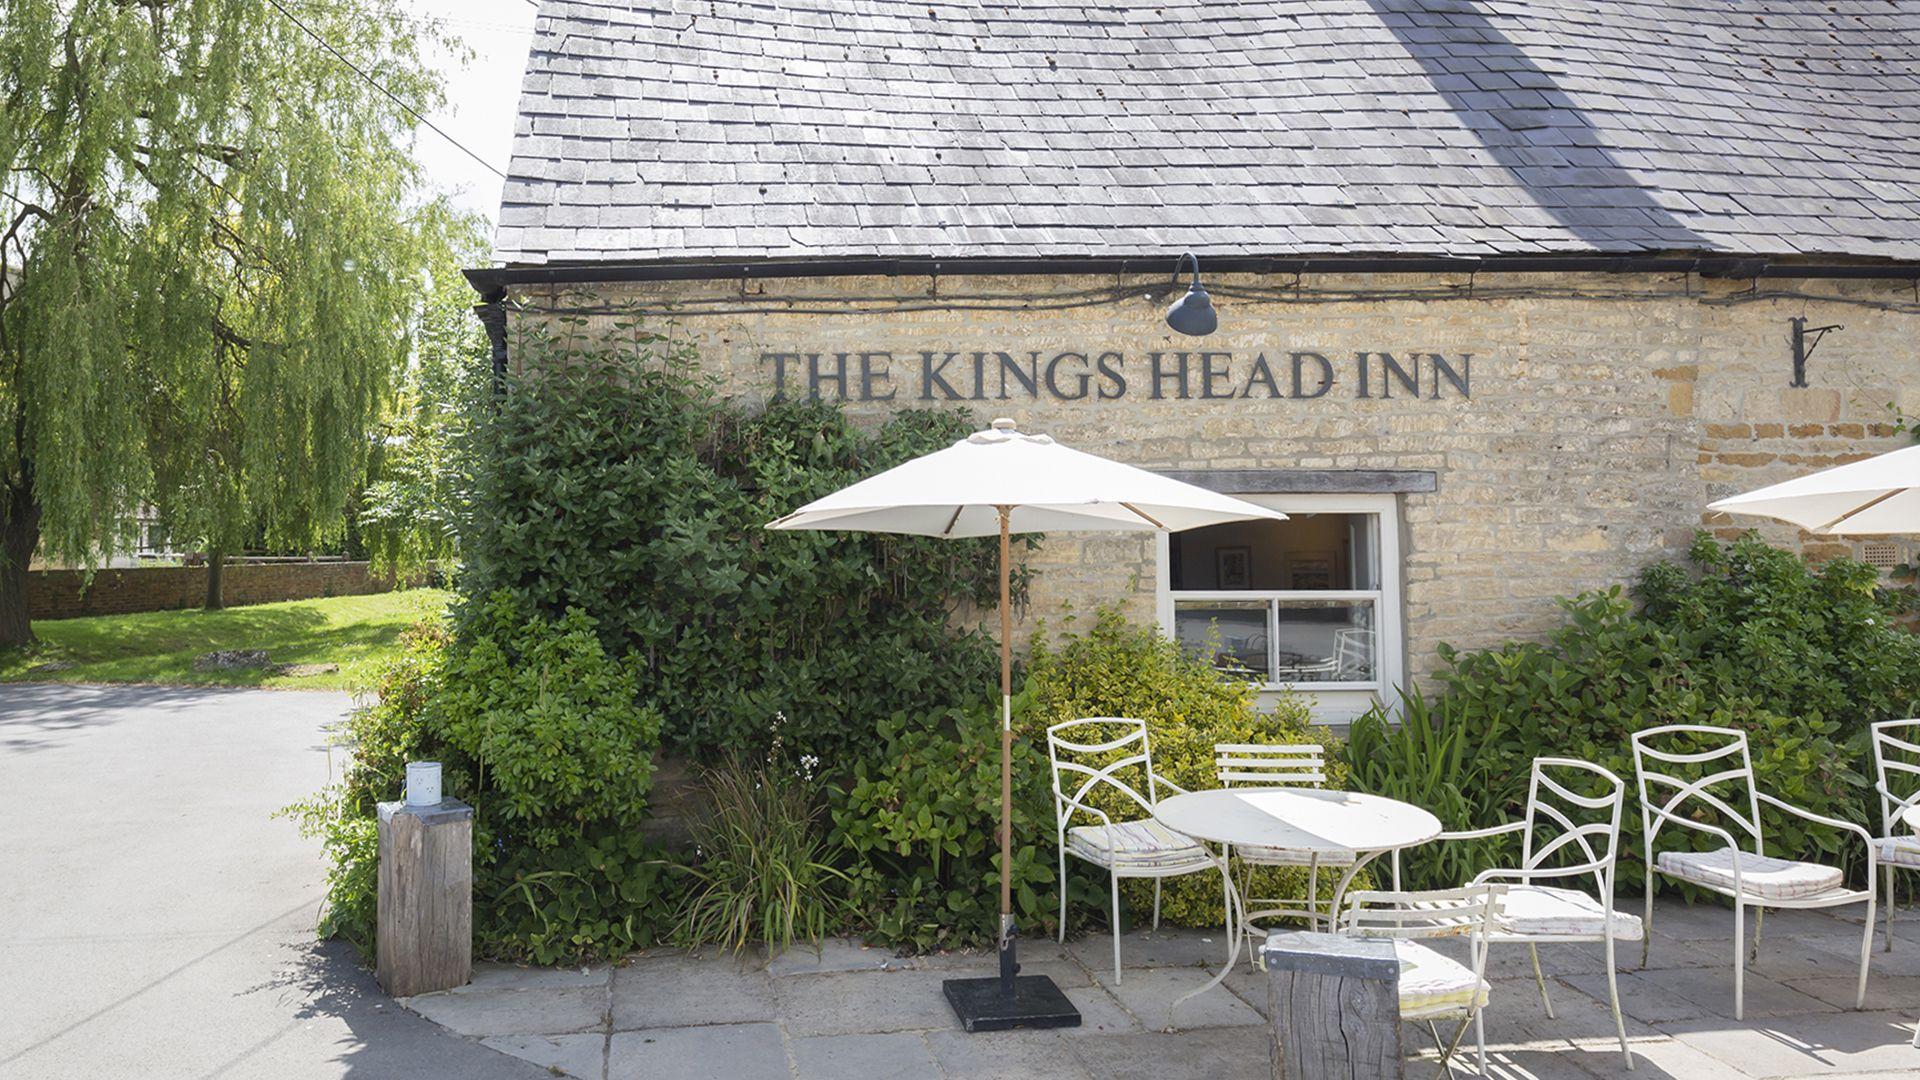 The Kings Head, Pub nearby Five Bells Garden Cottage, Bolthole Retreats